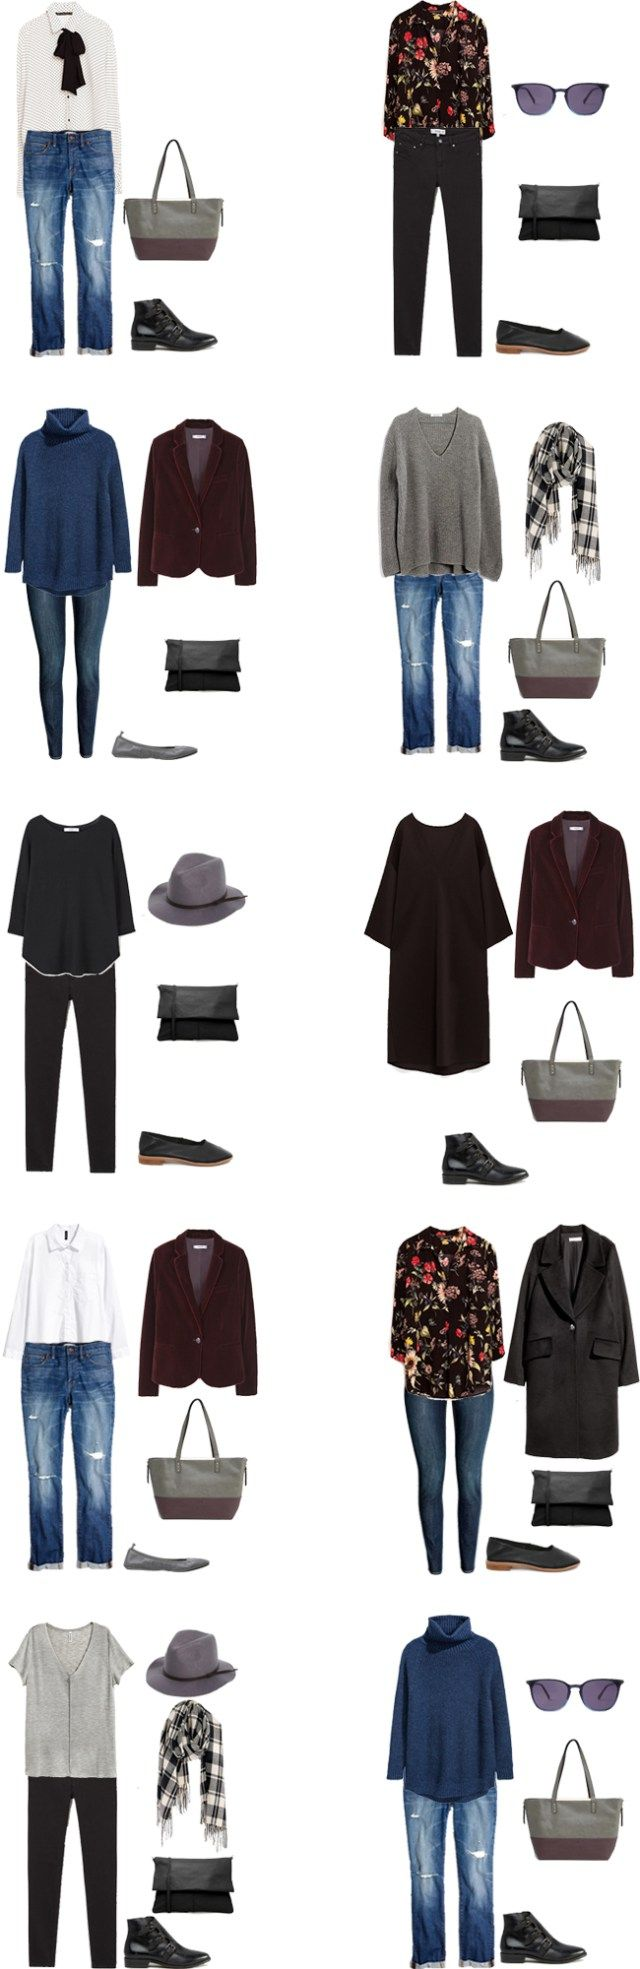 Outfit 1 – Floral Blouse • Zara | Blazer • Mango | Boyfriend Jeans • Madewell | Tote • Asos | Black Flats • Jeffrey Campbell Outfit 2 – Blue Turtleneck • H&M | Black Pants • Mango | Sunglasses • Azale